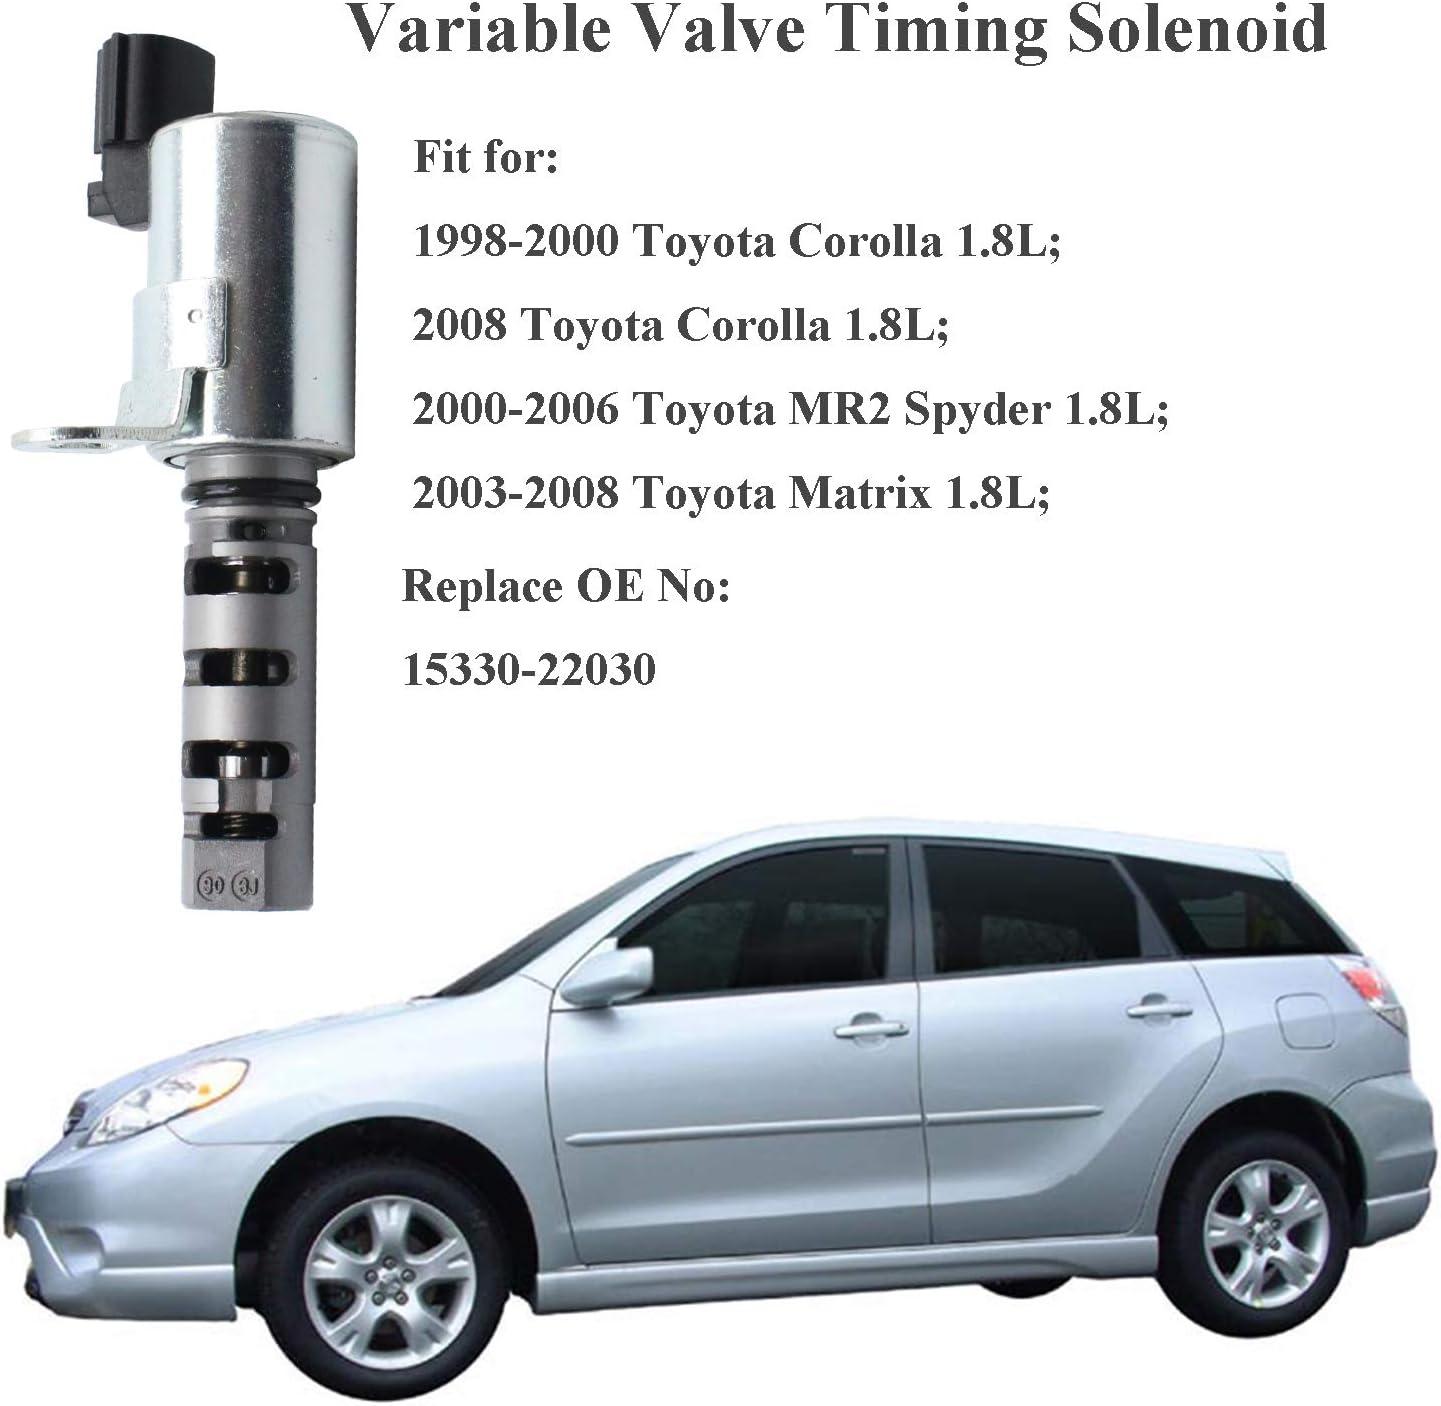 2003-2008 Toyota Matrix 2000-2005 Toyota MR2 Spyder 15330-22030 917-019 2000-2005 Toyota Celica VVT Solenoid For 1.8L Engines 2000-2008 Toyota Corolla BOXI Engine Variable Valve Timing